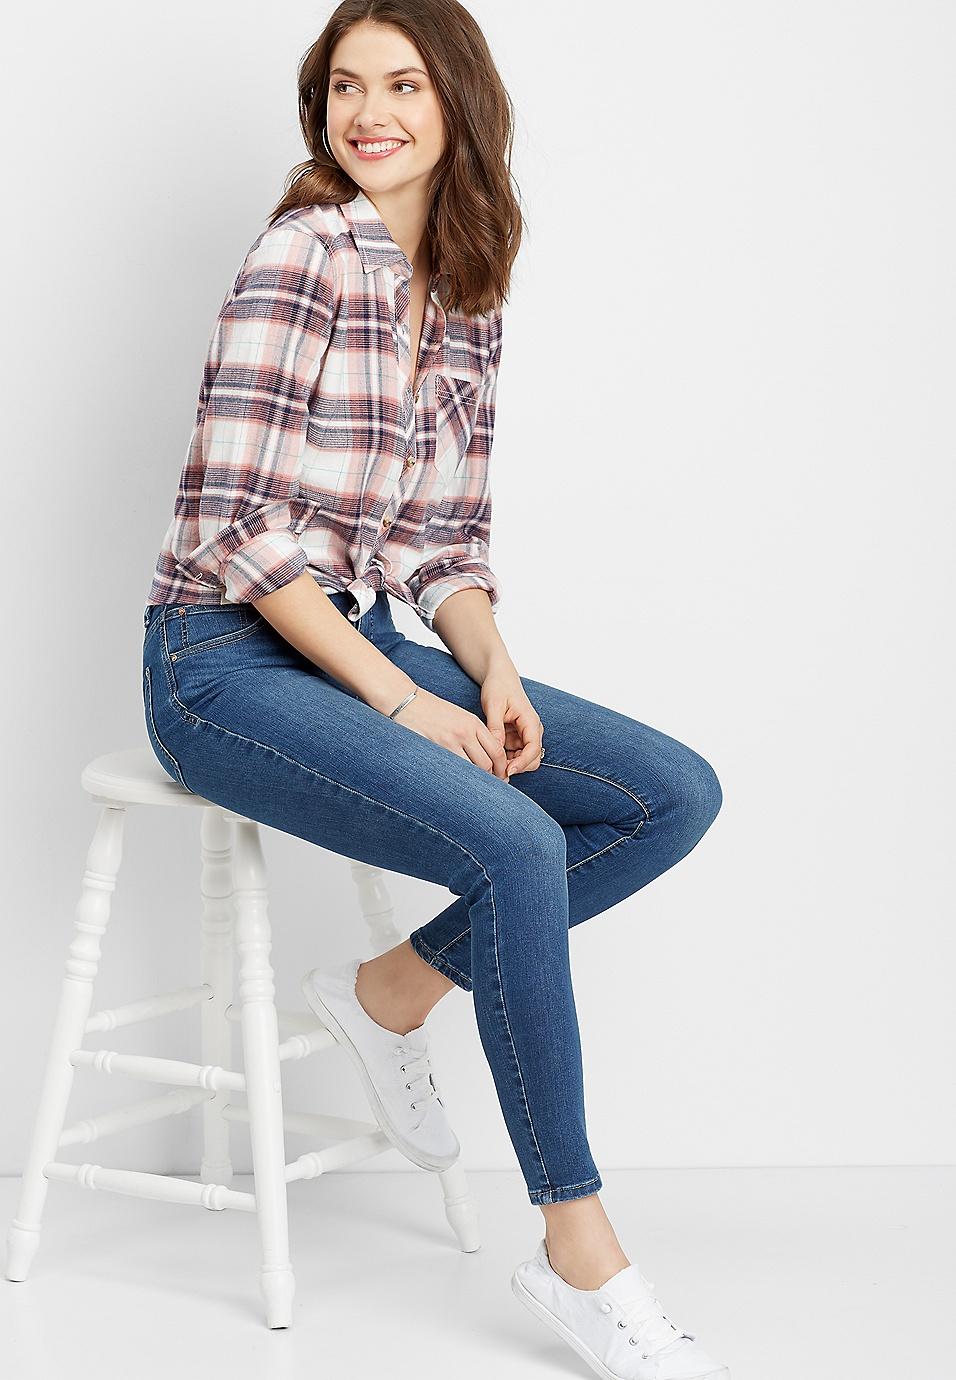 1108f7b9d7 Everflex™ high rise medium stretch skinny jeans